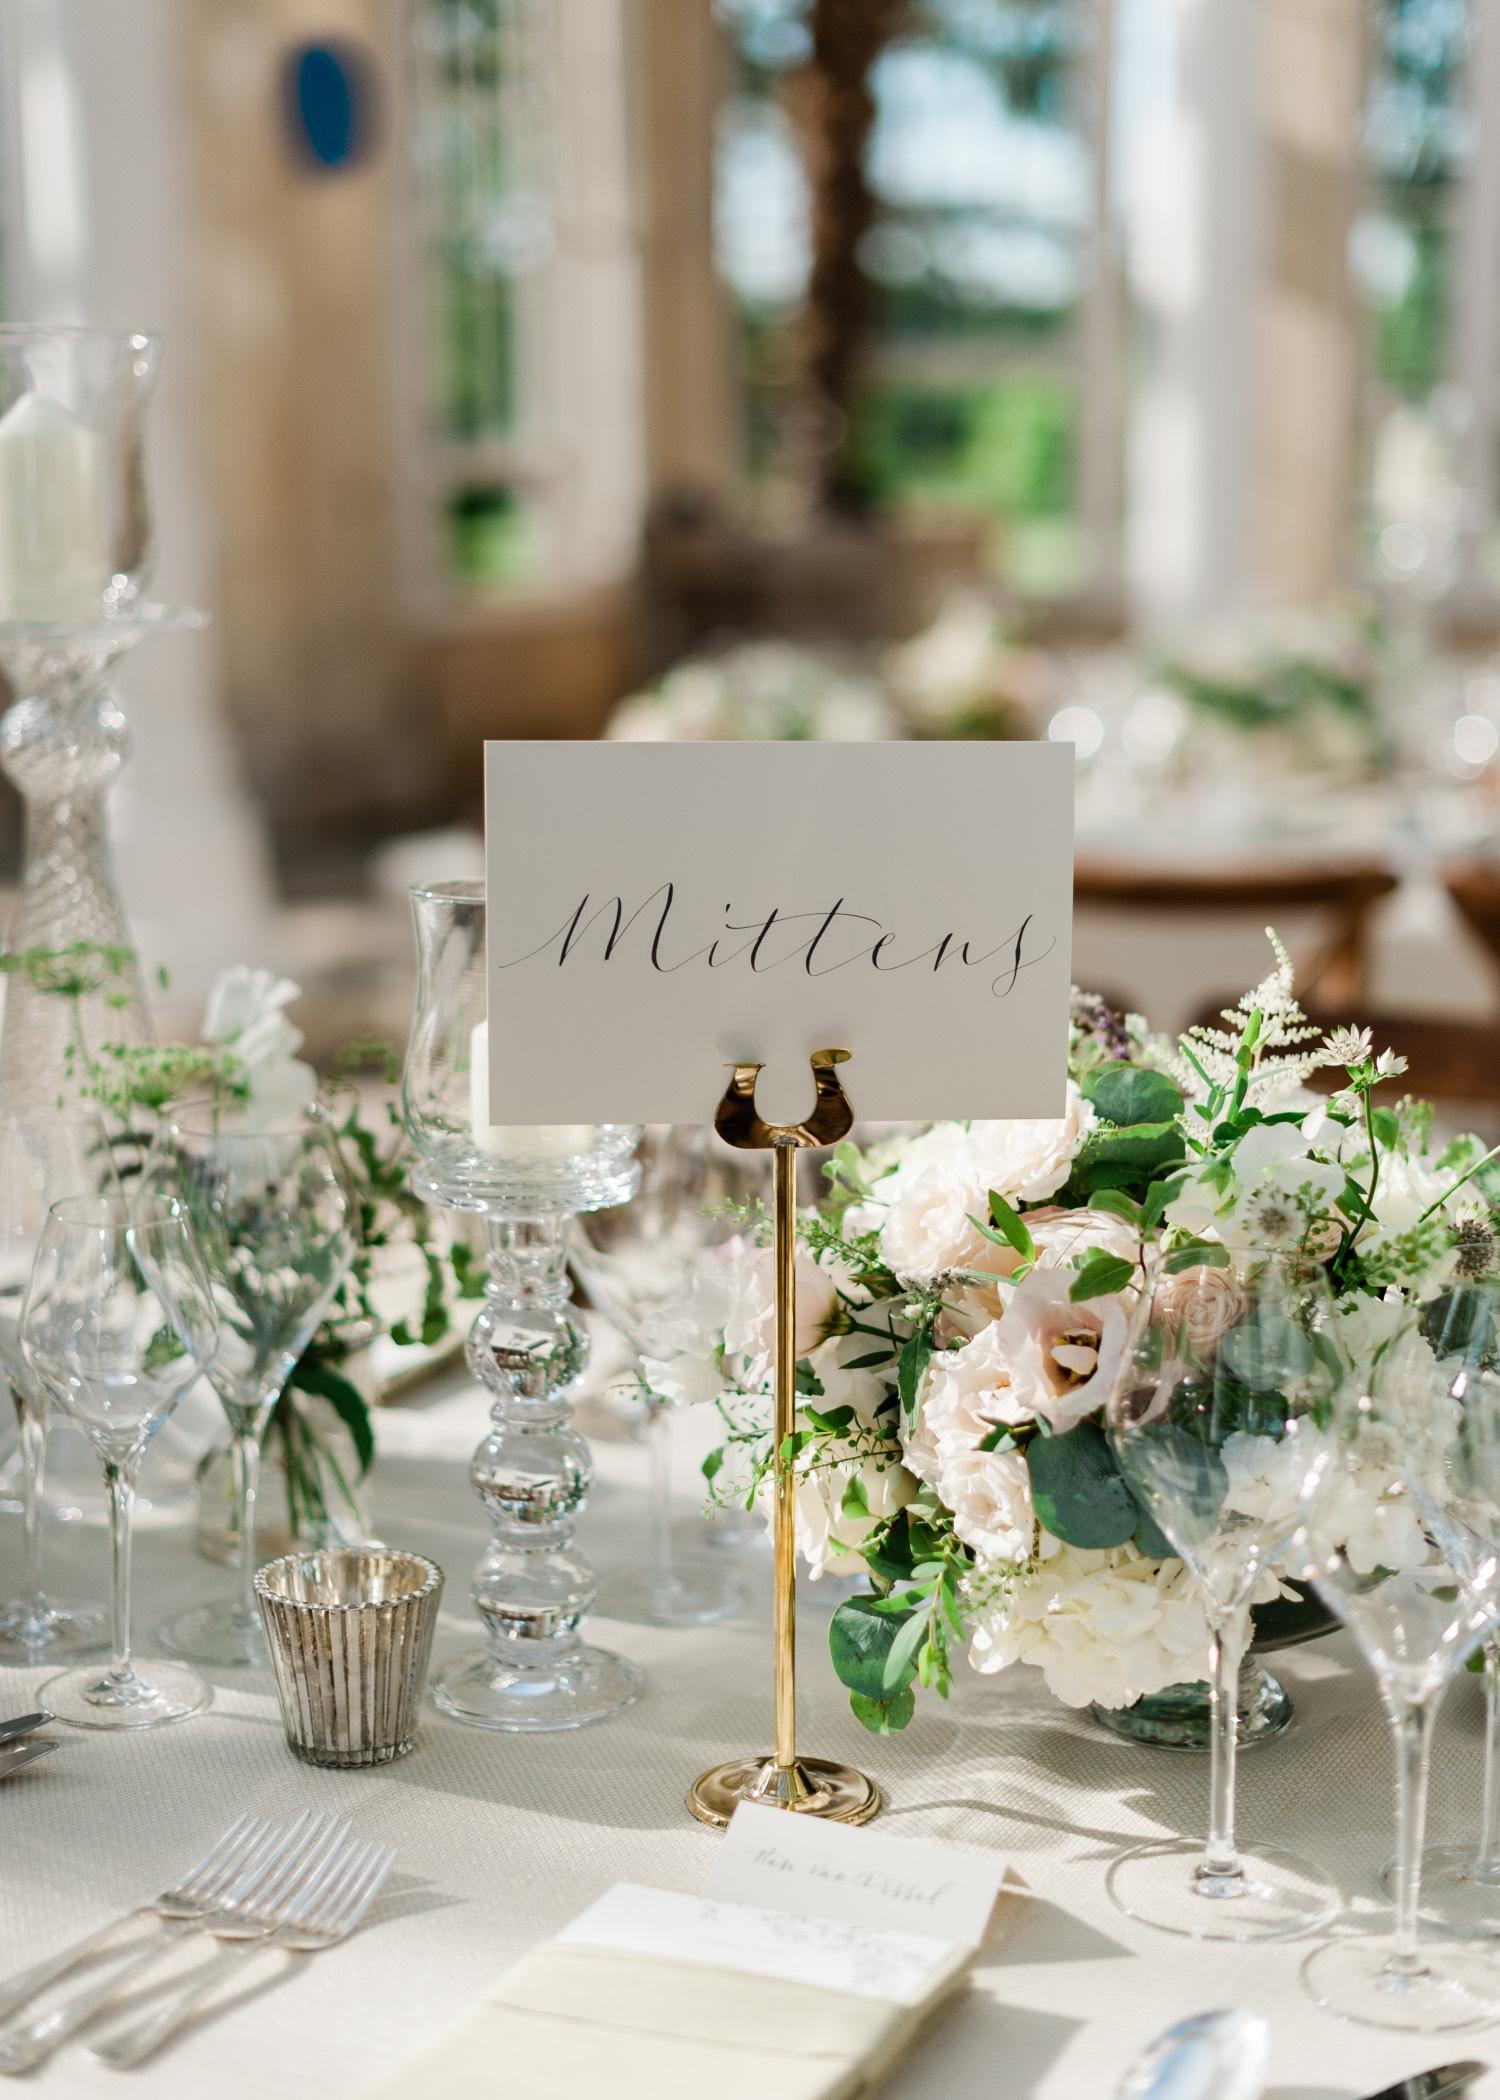 Littleton-Rose-Syon-House-London-Wedding-Planner-Tablescape.jpg